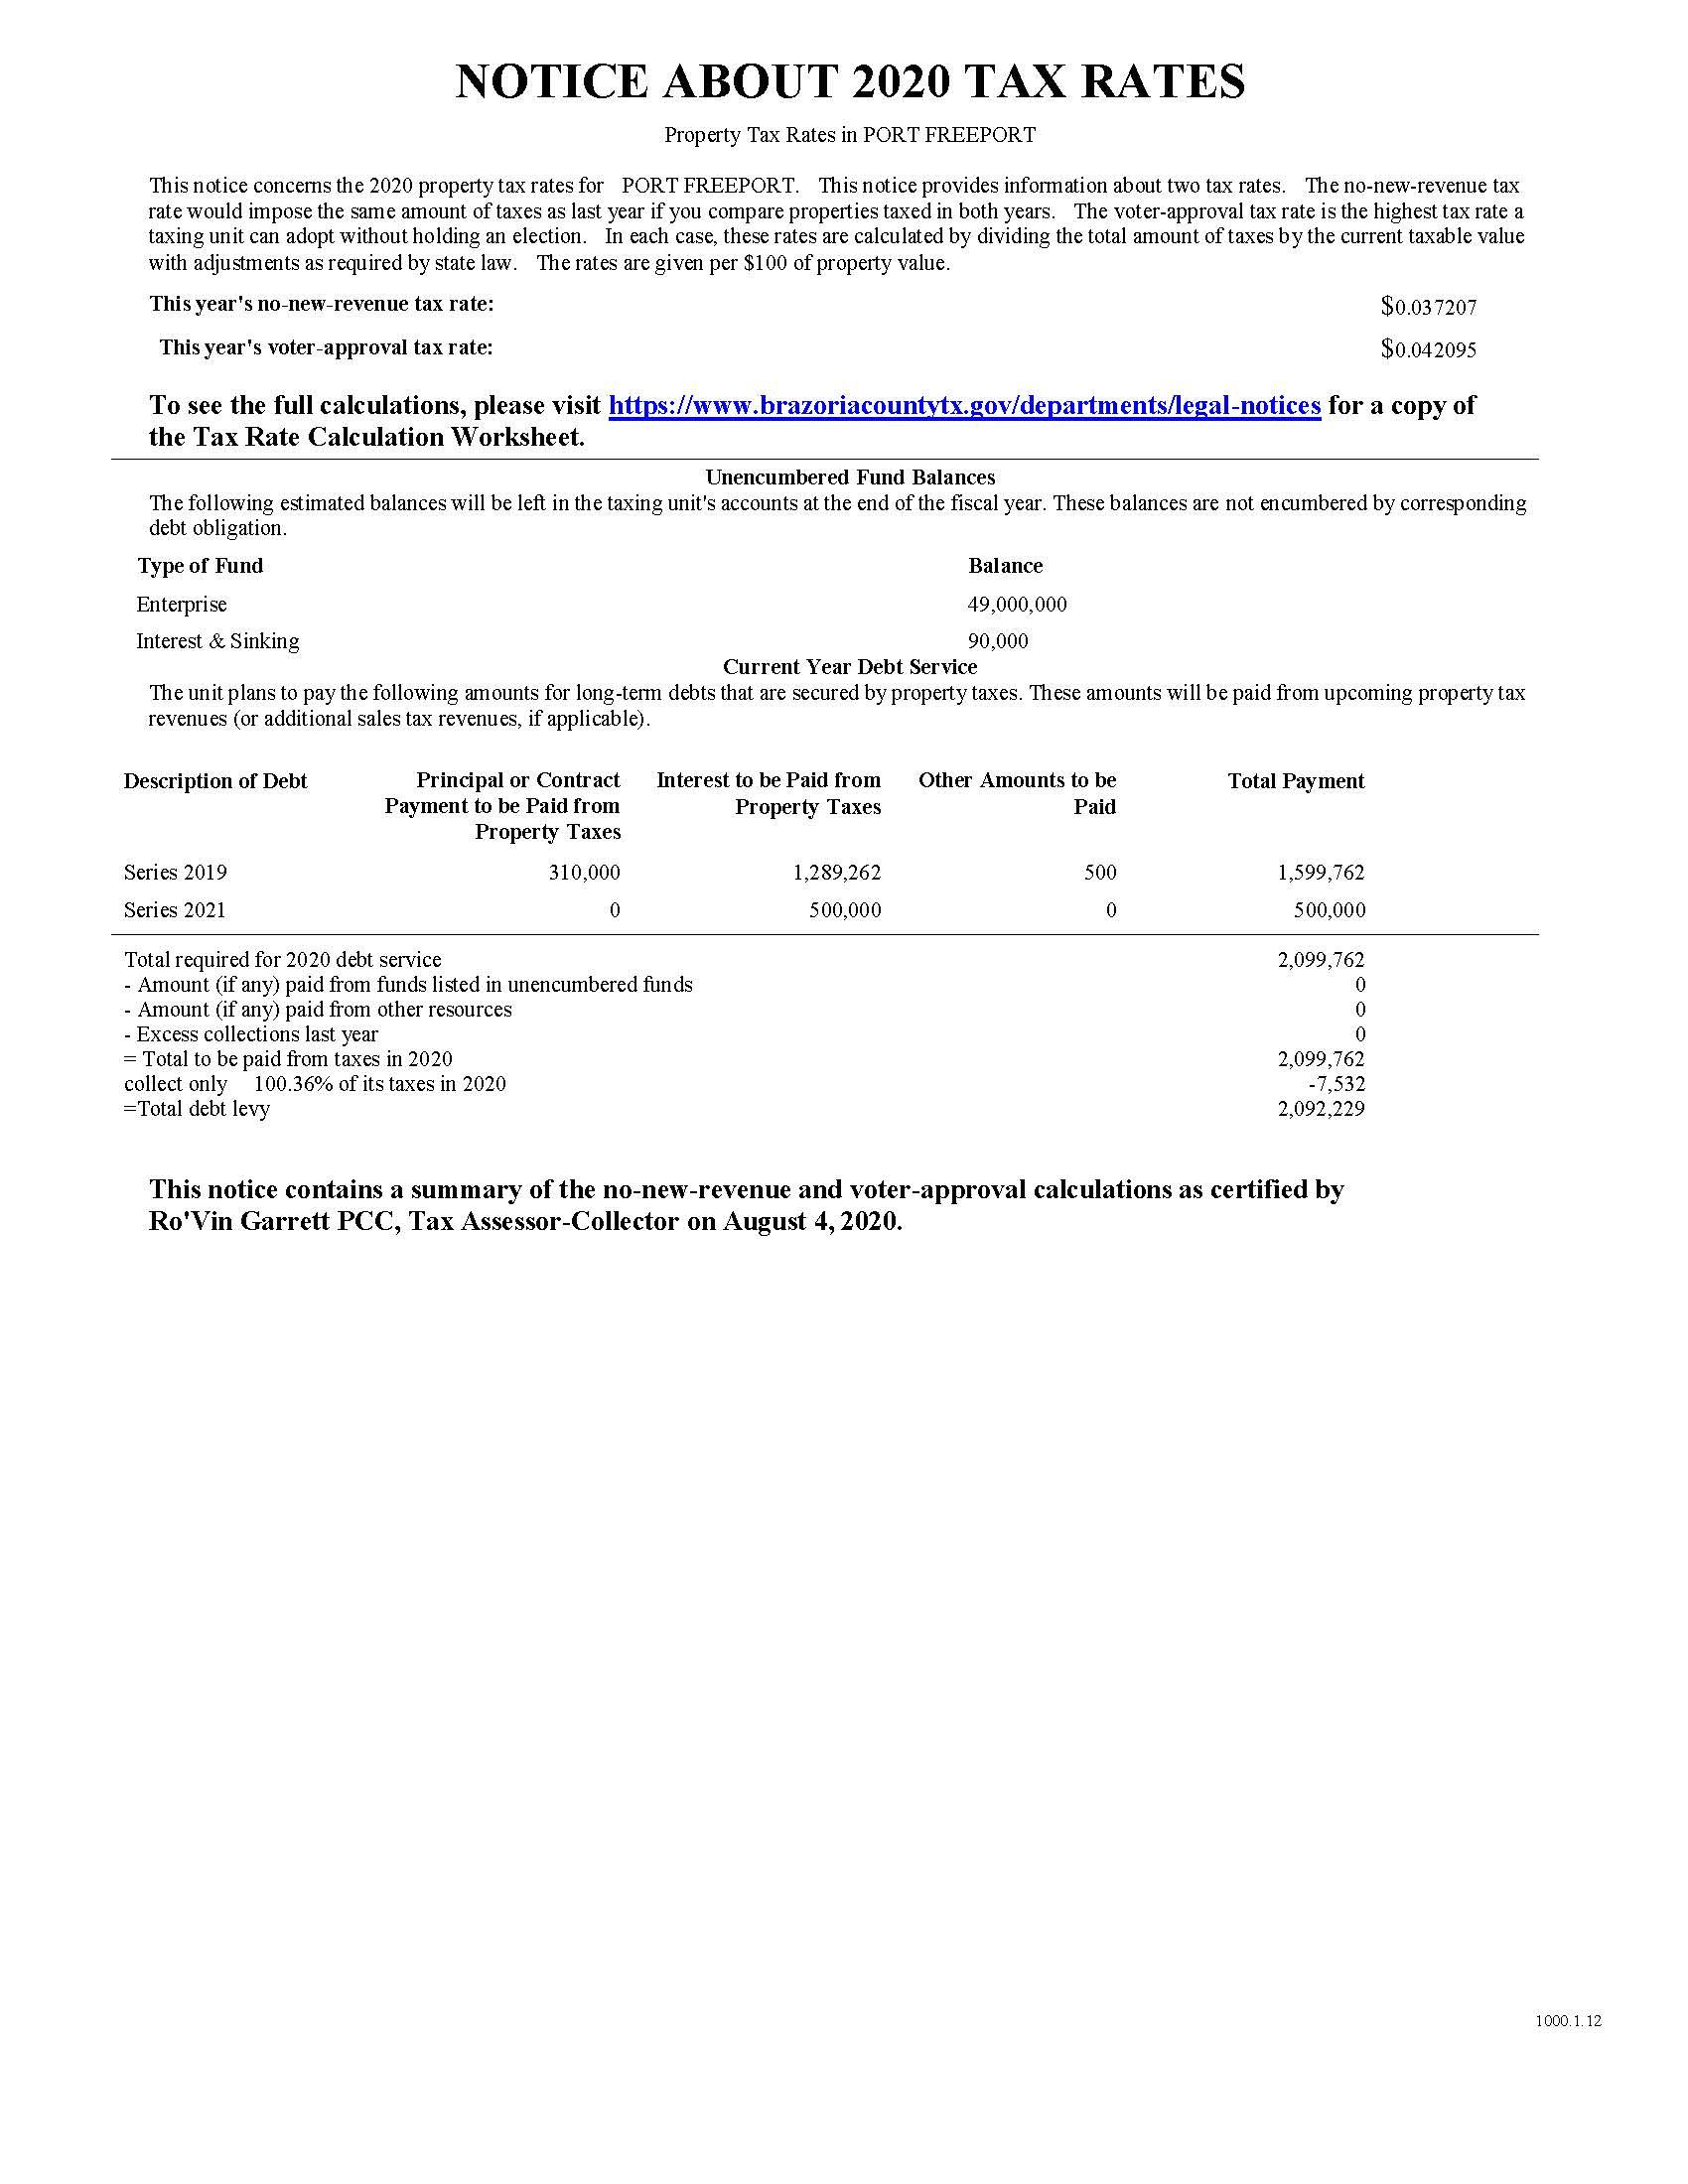 Port Freeport Notice of Tax Rates